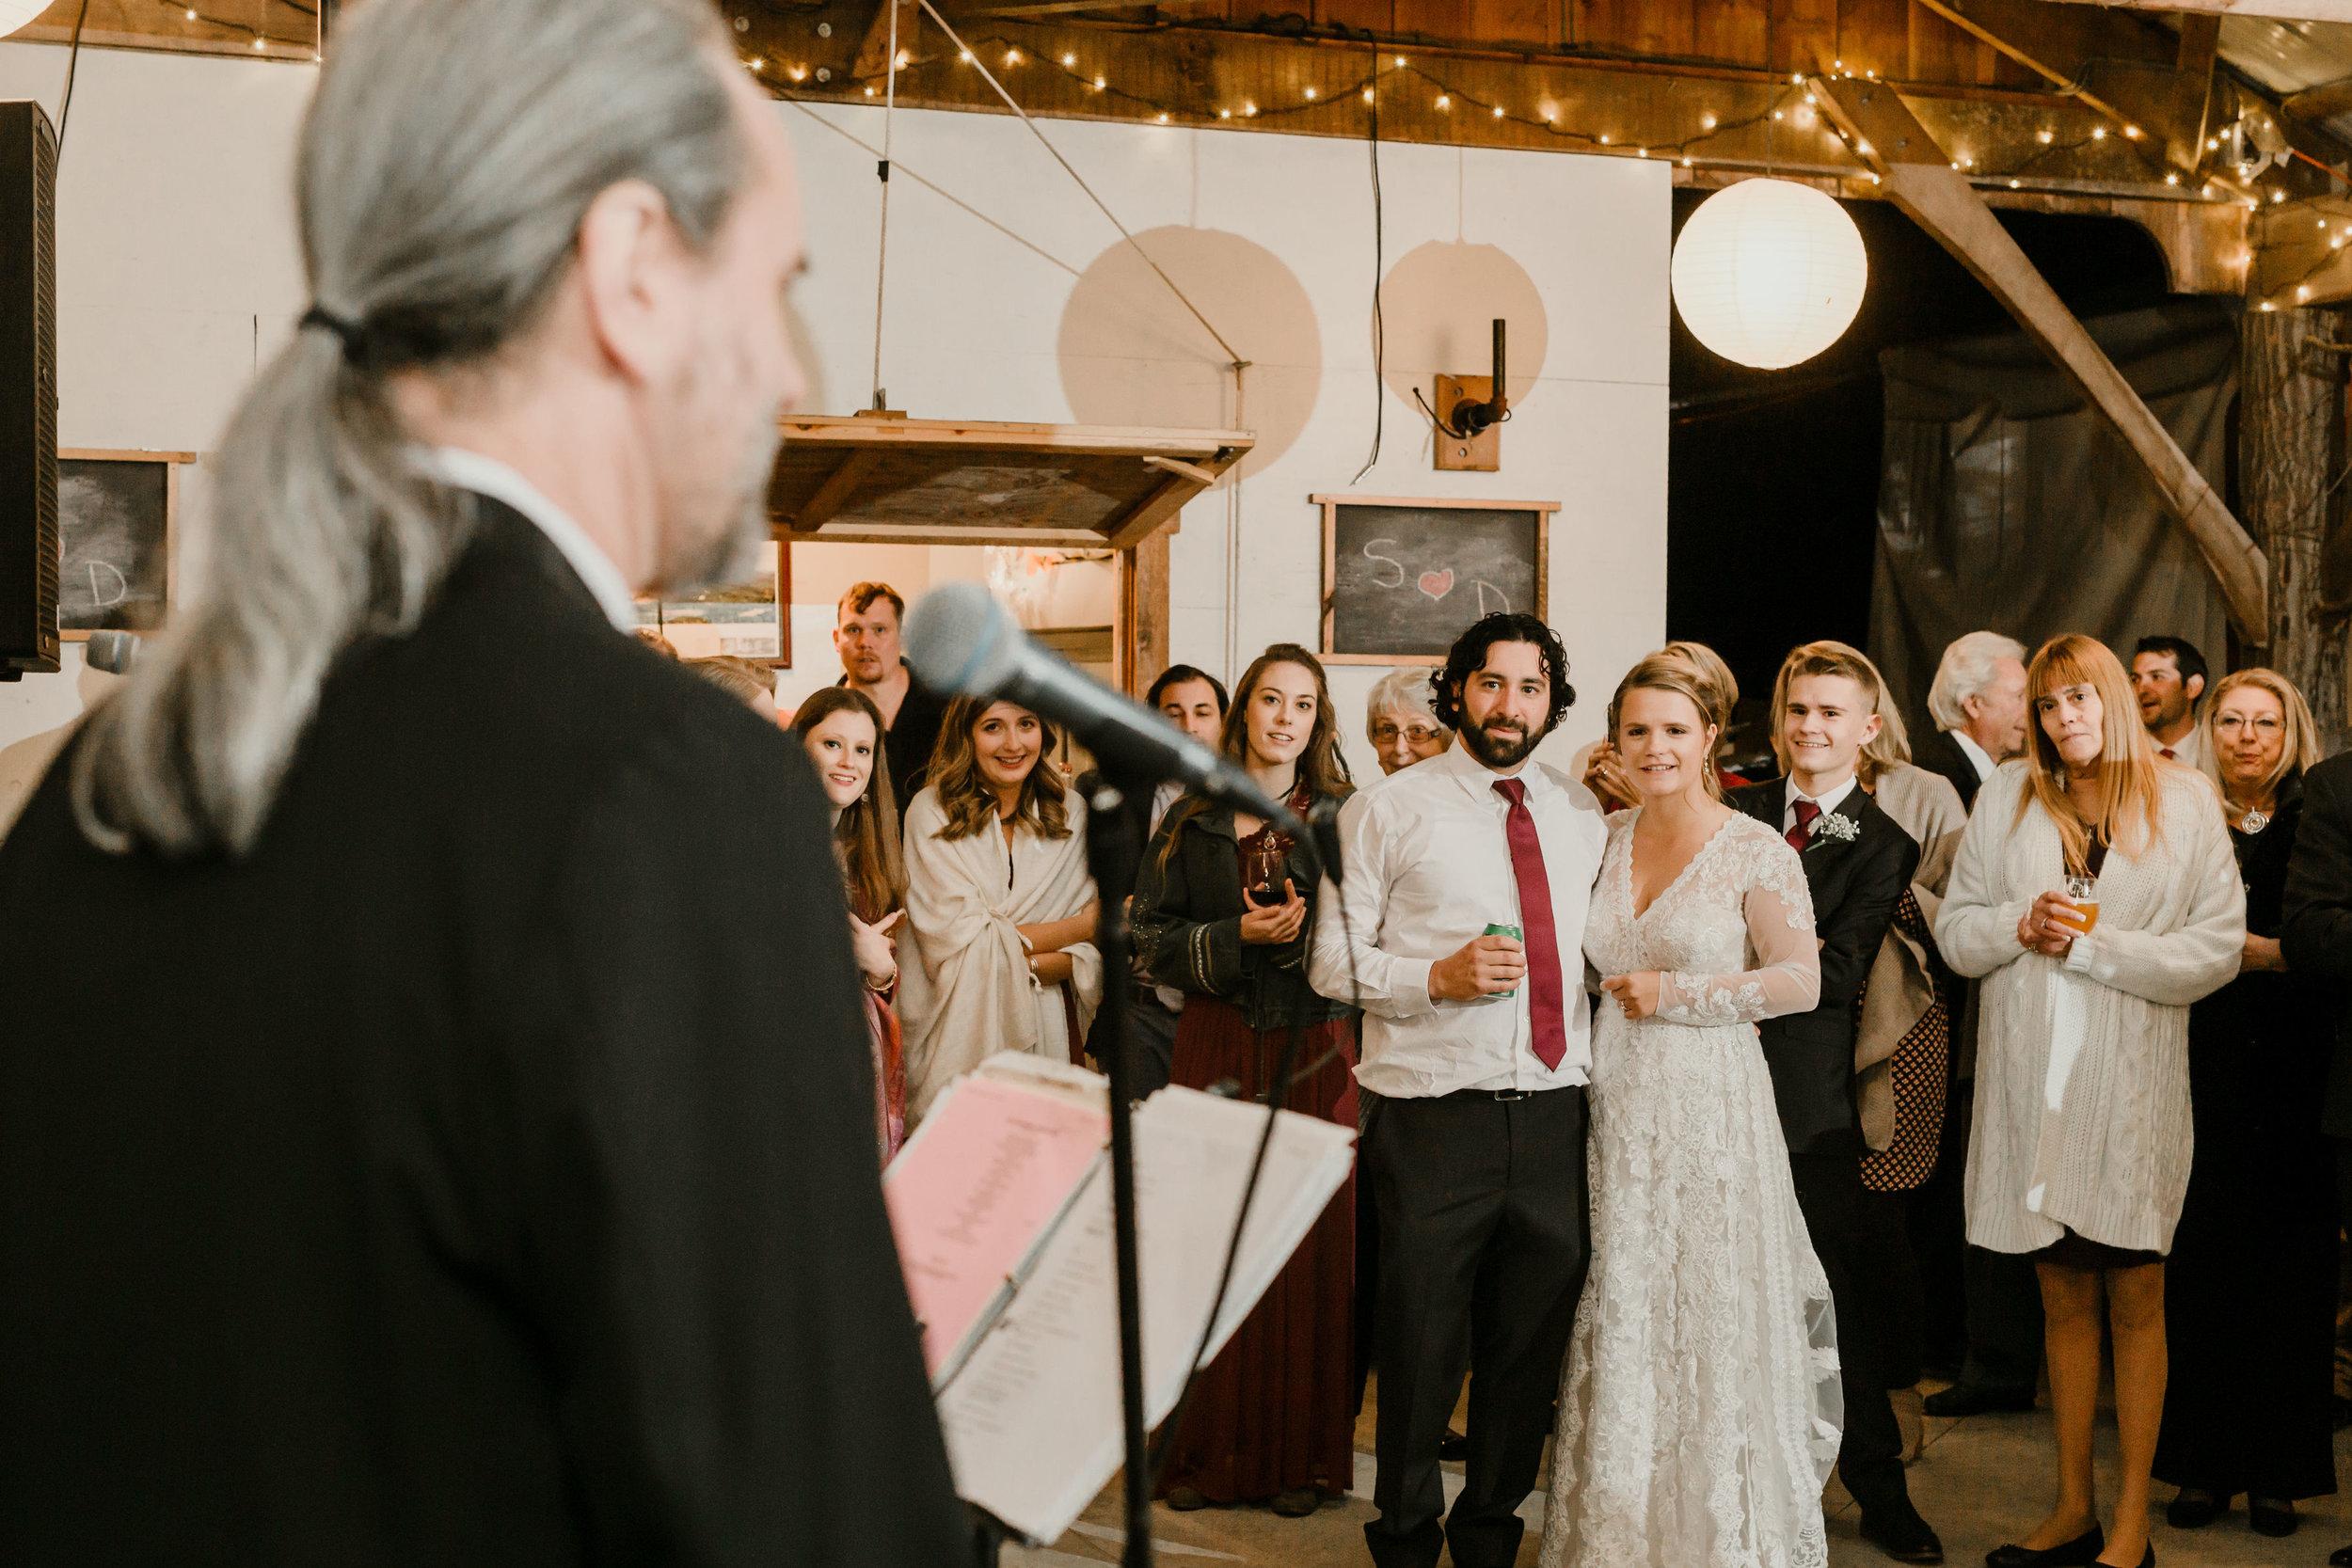 young-love-media-rustic-fall-autumn-wedding-emmerich-tree-farm-hudson-valley-warwick-new-york-reception-255.jpg